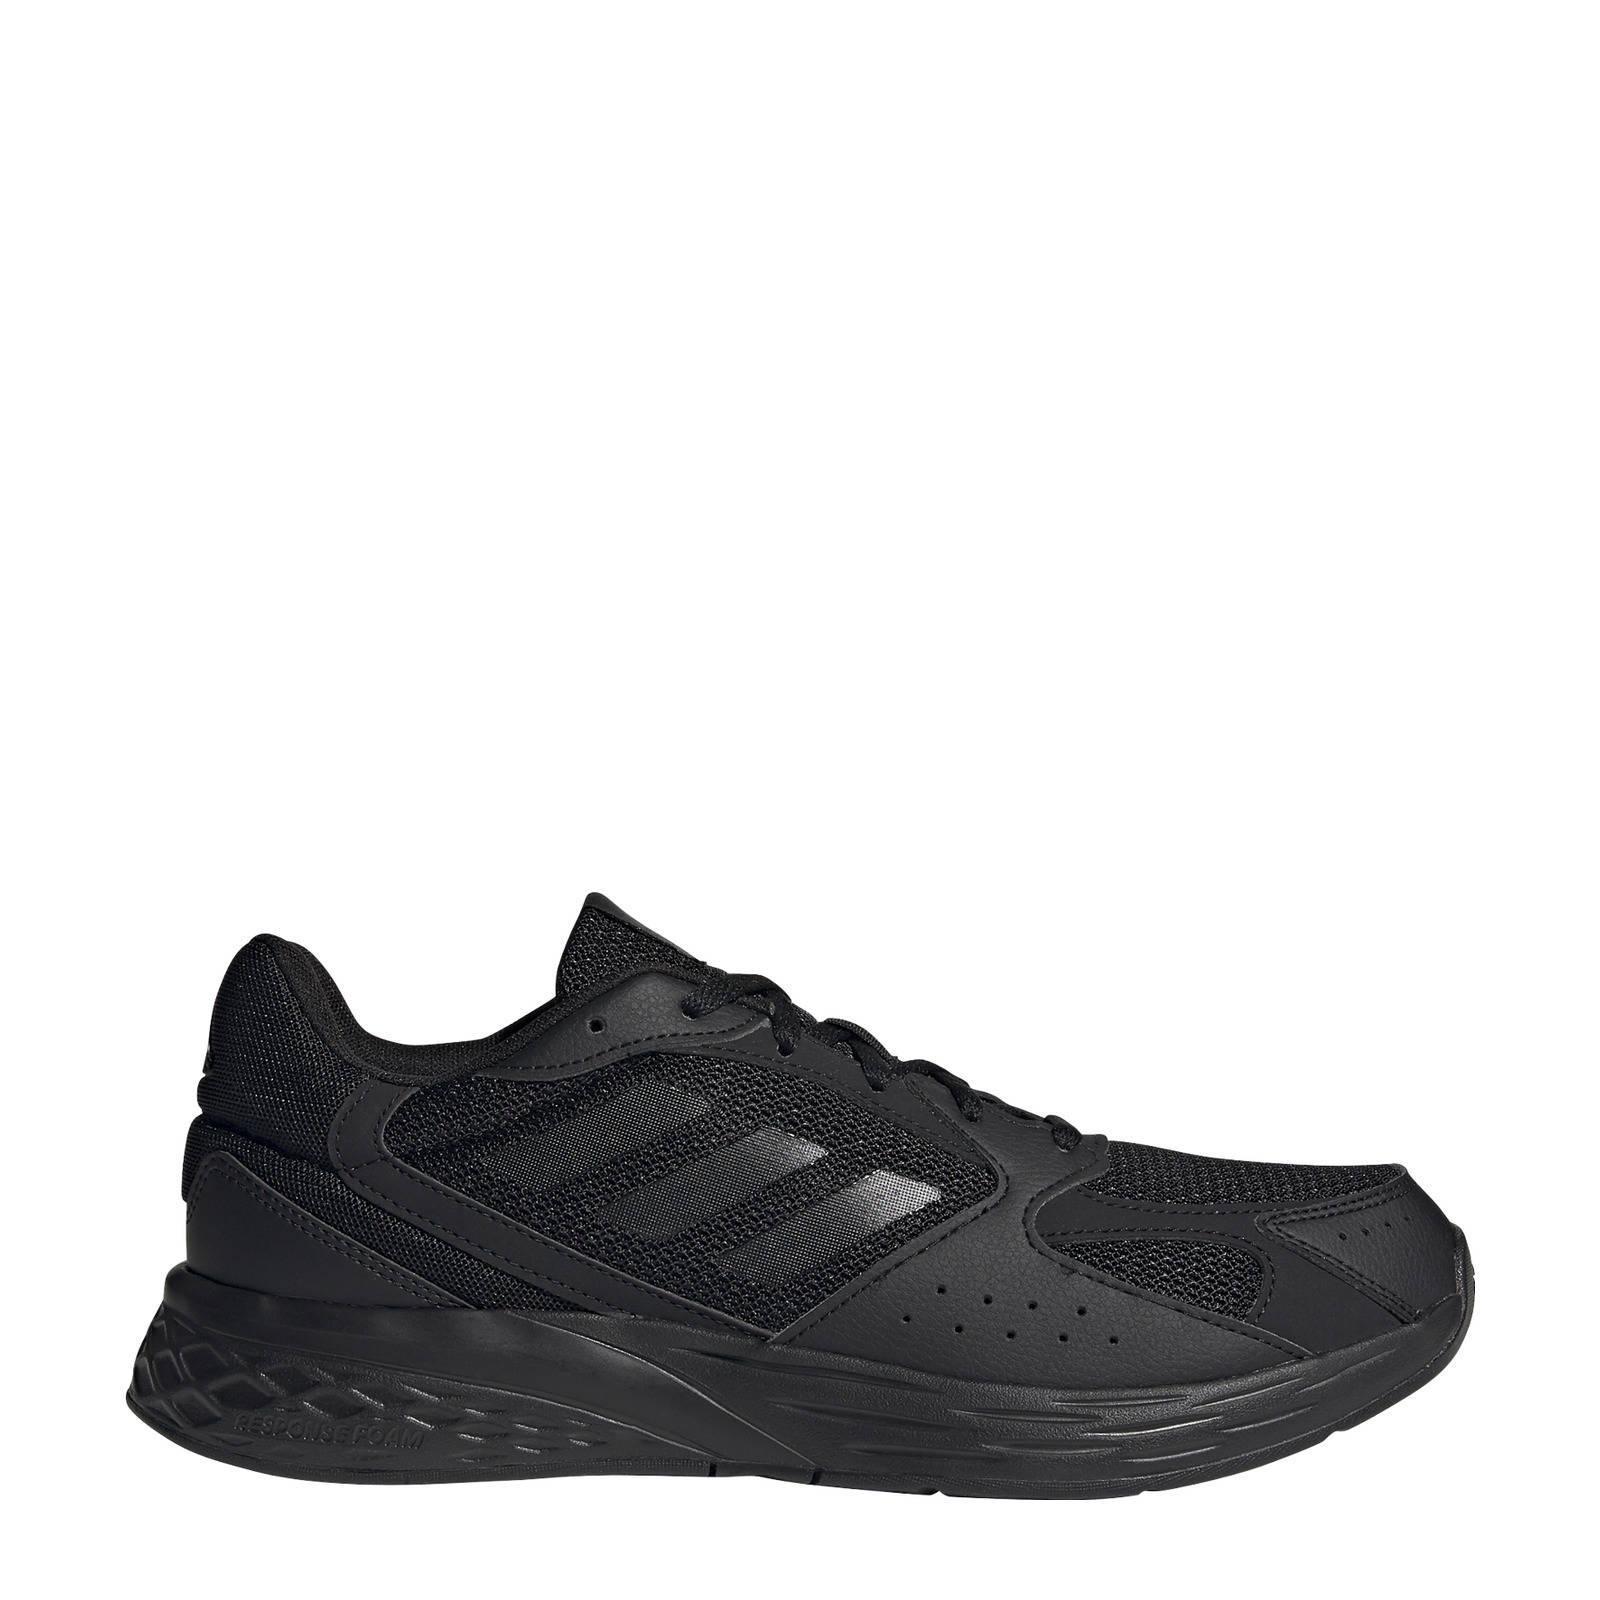 Adidas Performance Response -Run sneakers zwart online kopen